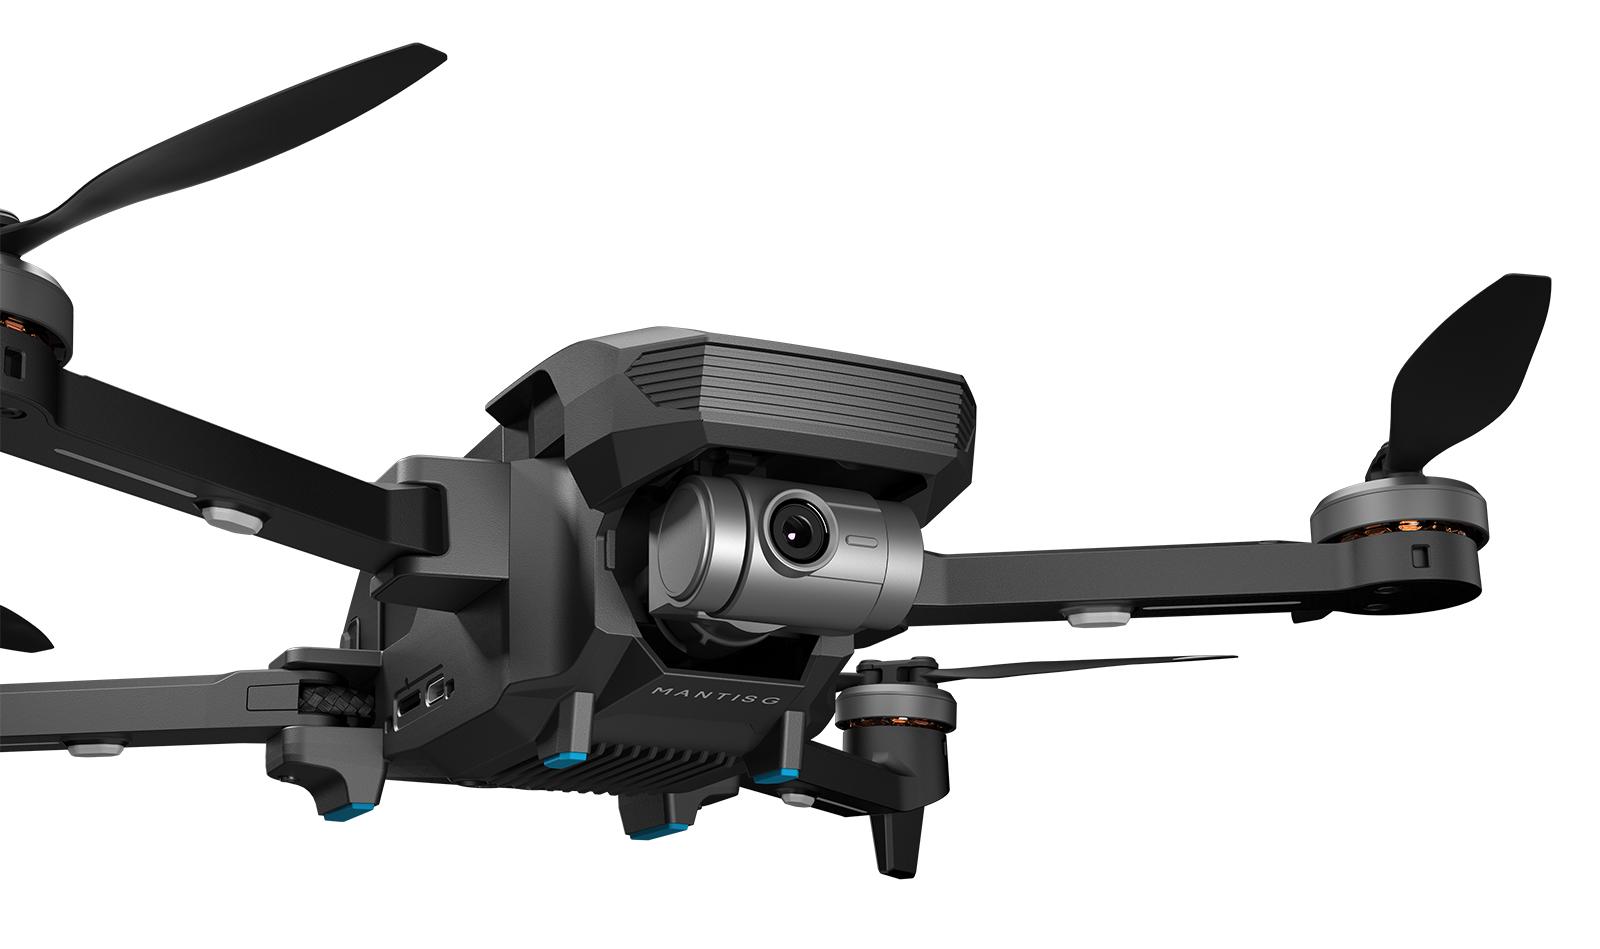 Mantis G dron 4K